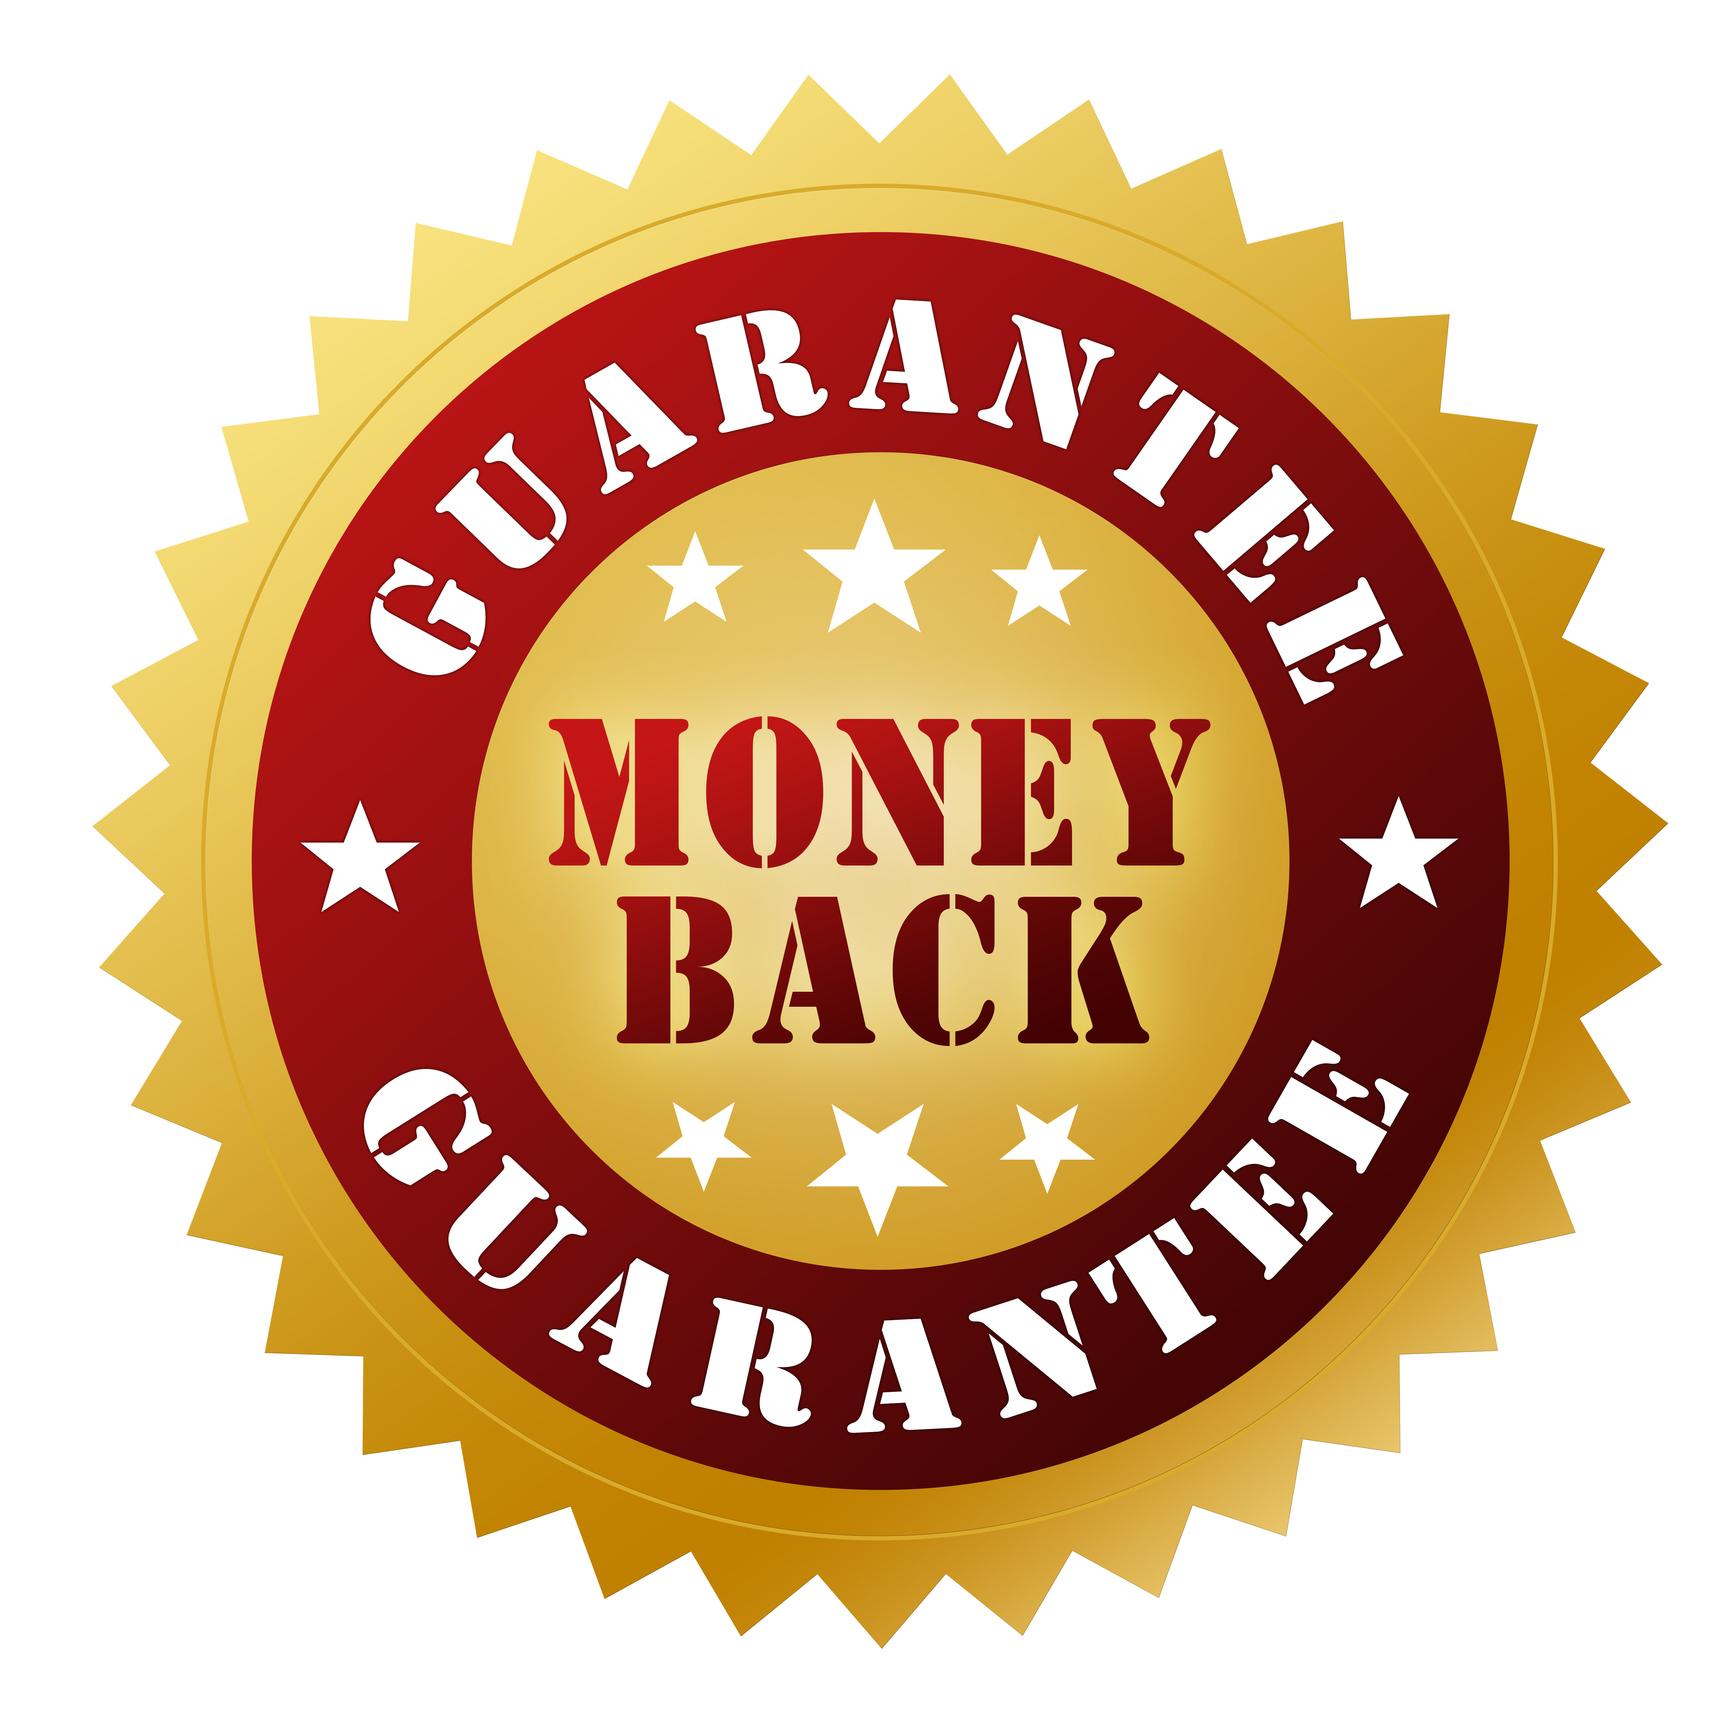 200% Money Back Guarantee